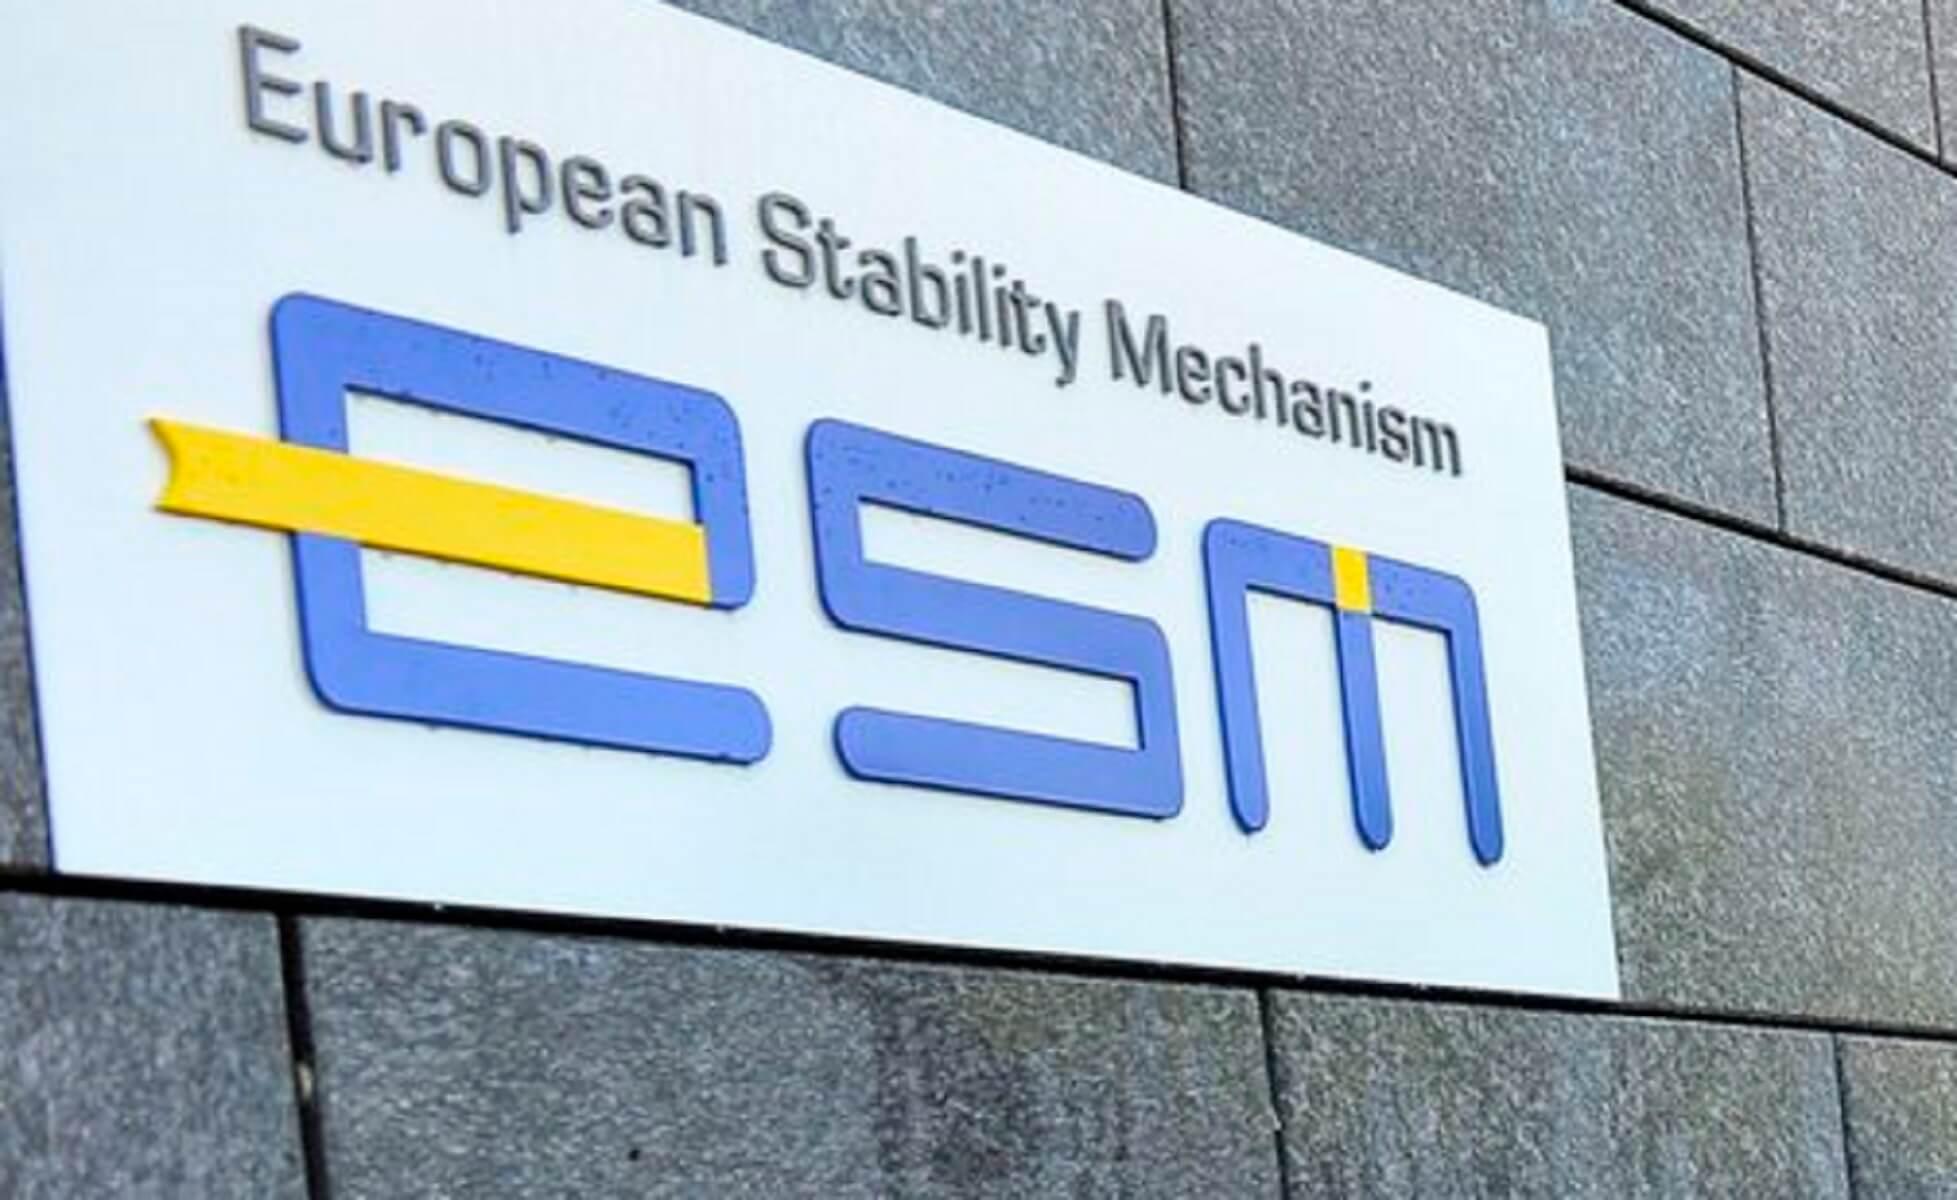 ESM: Άλλο ένα μέτρο ελάφρυνσης του ελληνικού χρέους